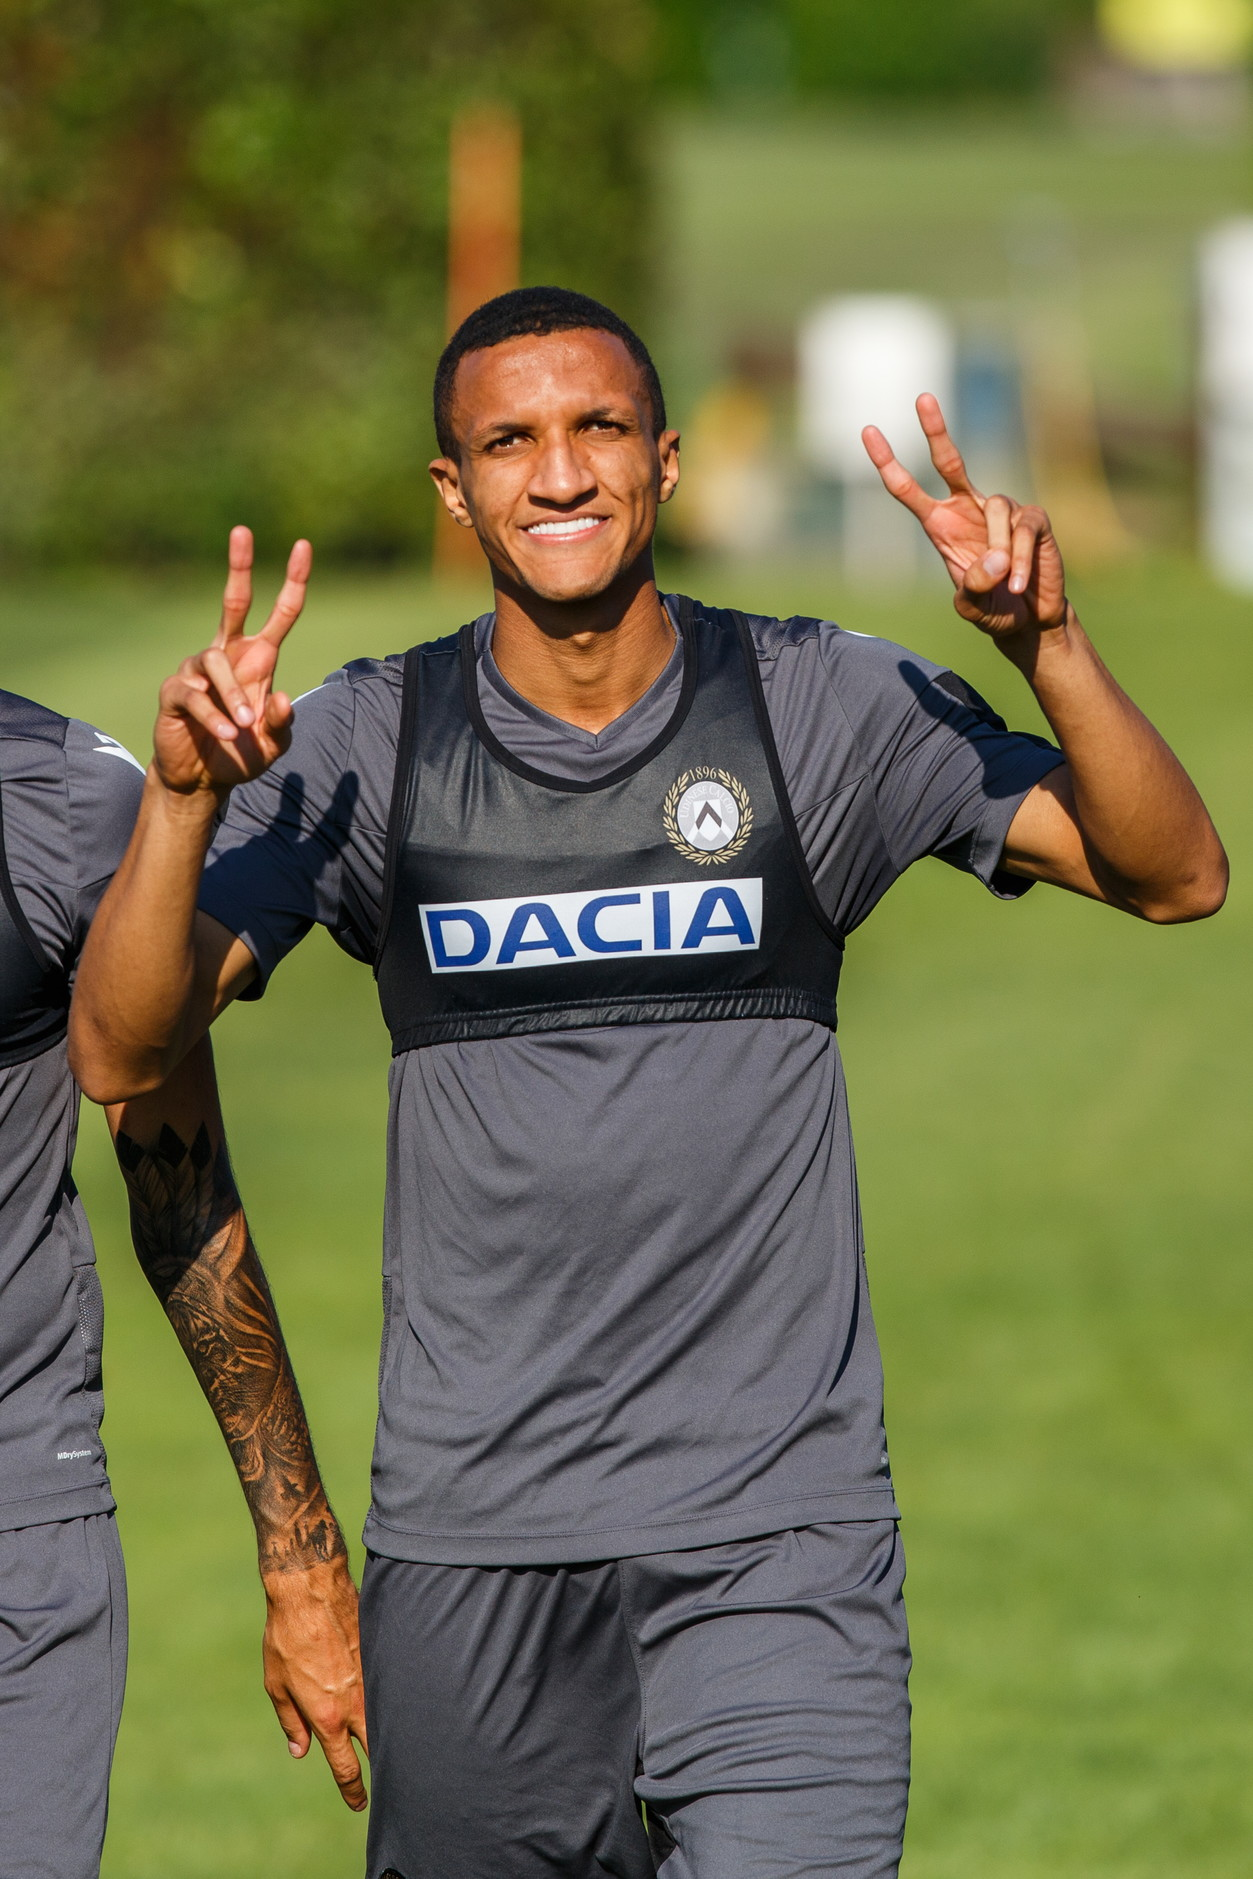 Rodrigo Becao, difensore dell'Udinese, arriva dal Cska Mosca